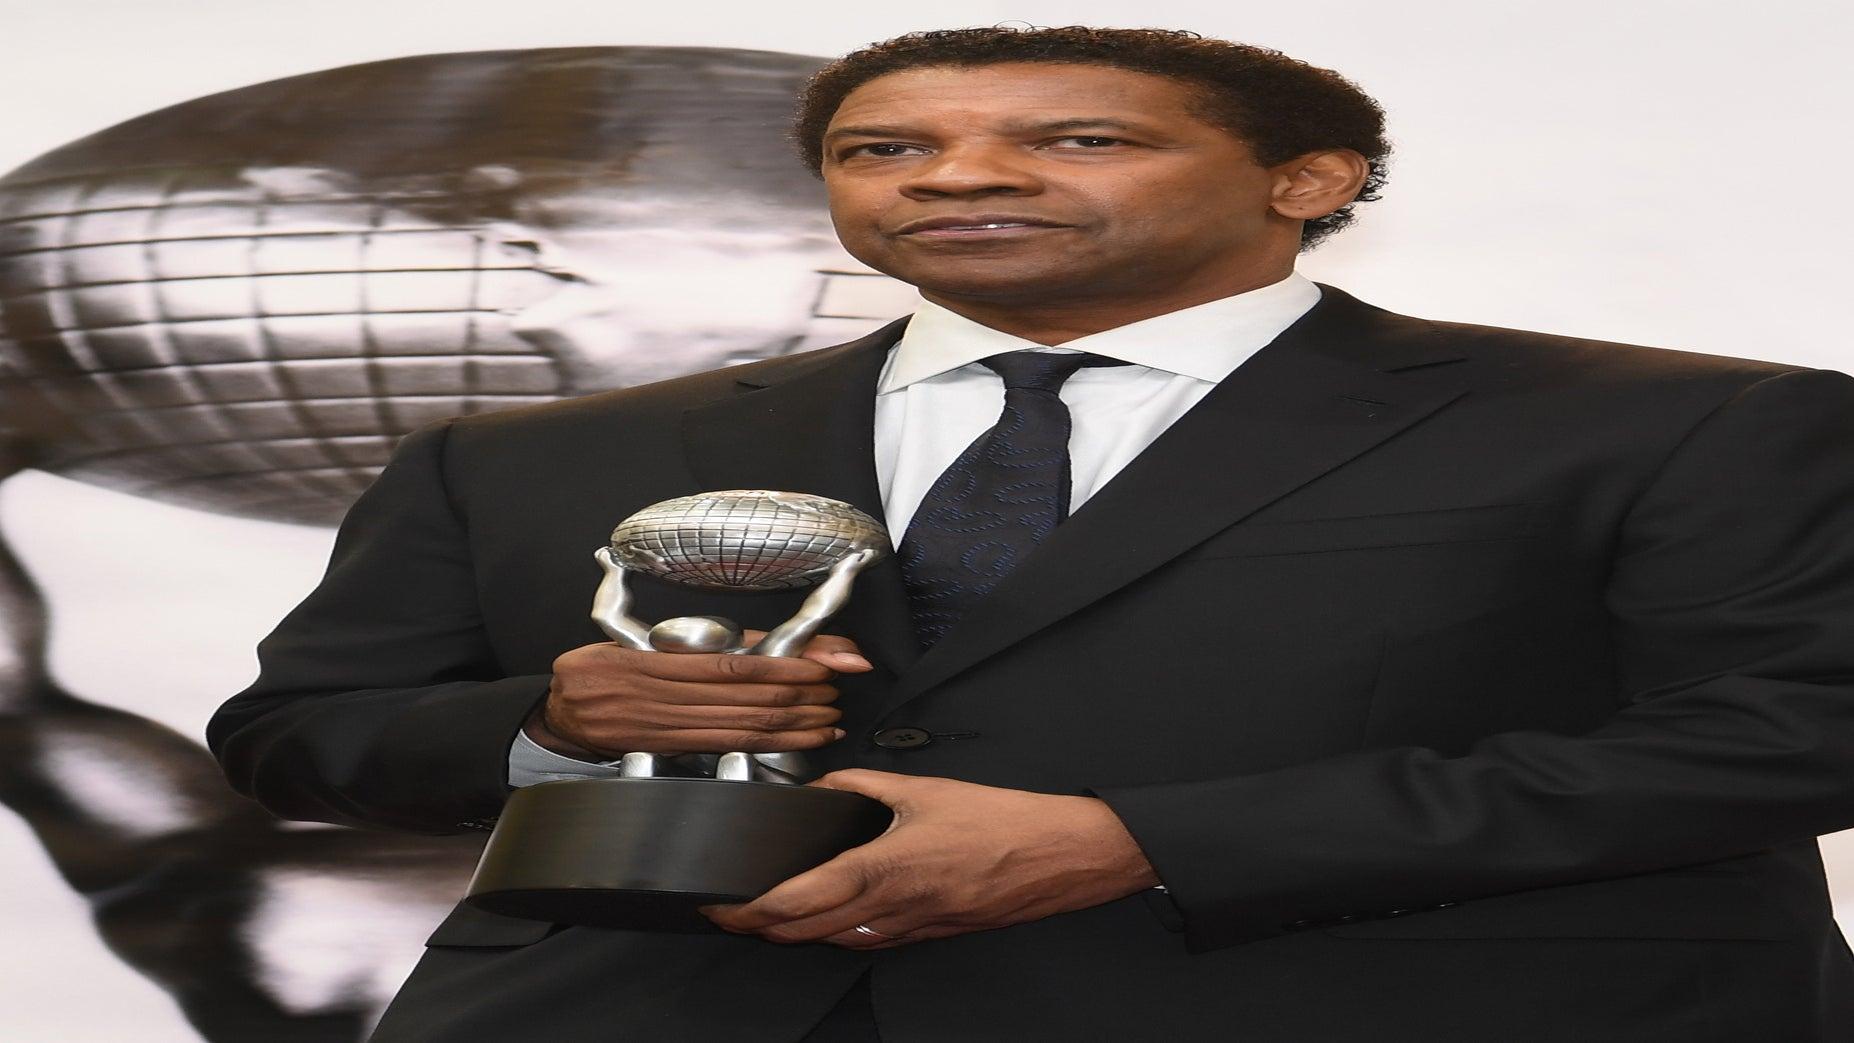 Denzel Washington Salutes Black Actresses In Empowering NAACP Awards Speech